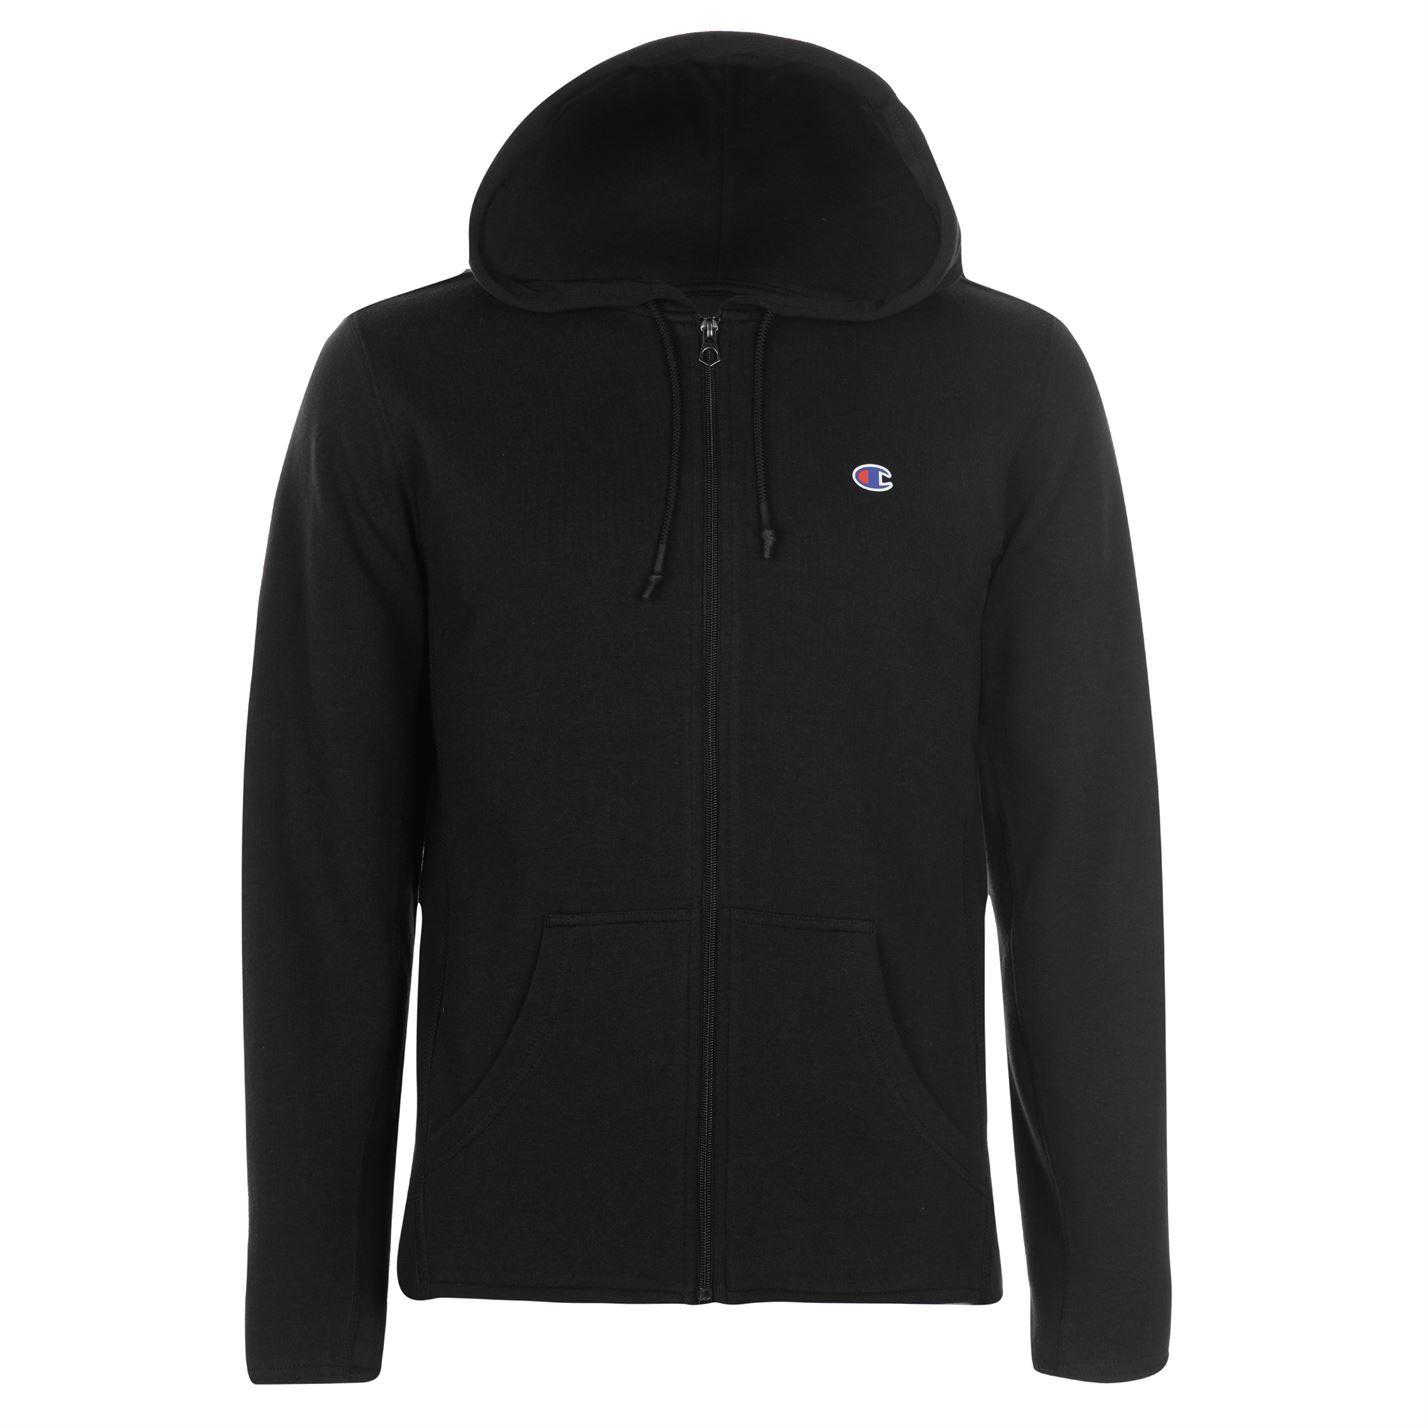 Champion-Interlock-Full-Zip-Hoody-Mens-Hoodie-Top-Sweatshirt-Sweater thumbnail 5